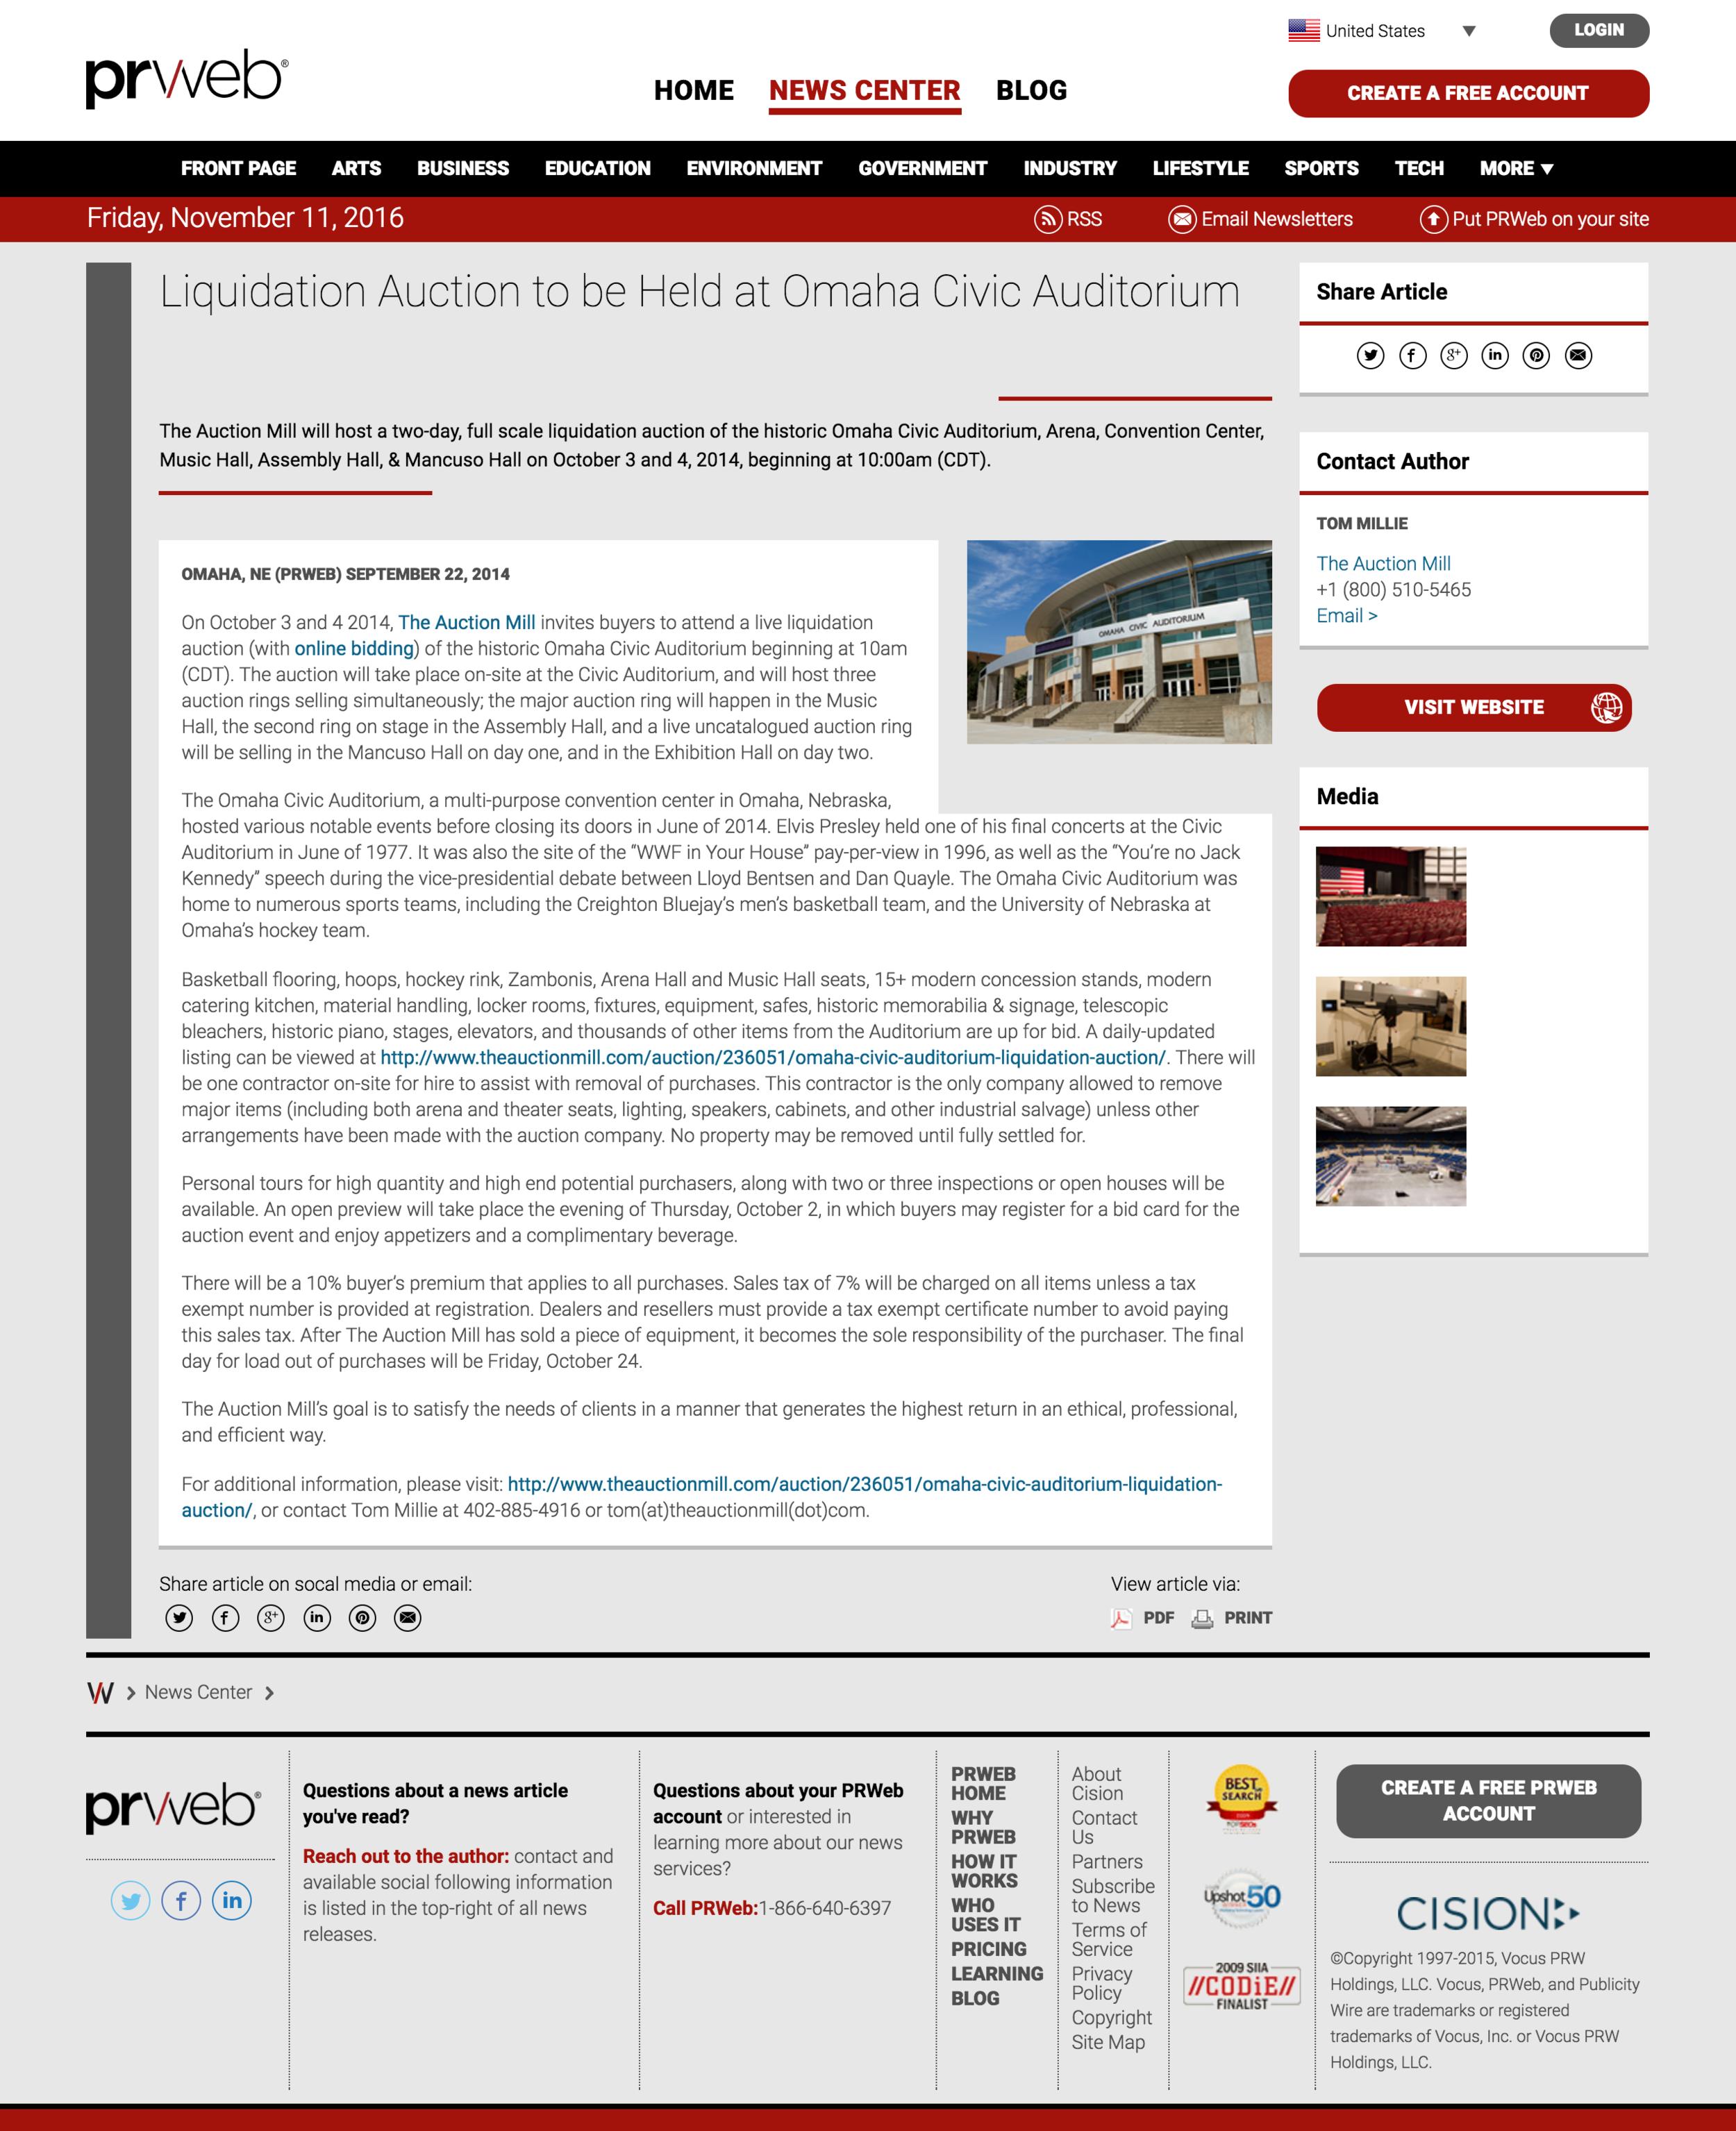 screencapture-prweb-releases-2014-9-prweb12169680-htm-1478889576814.png